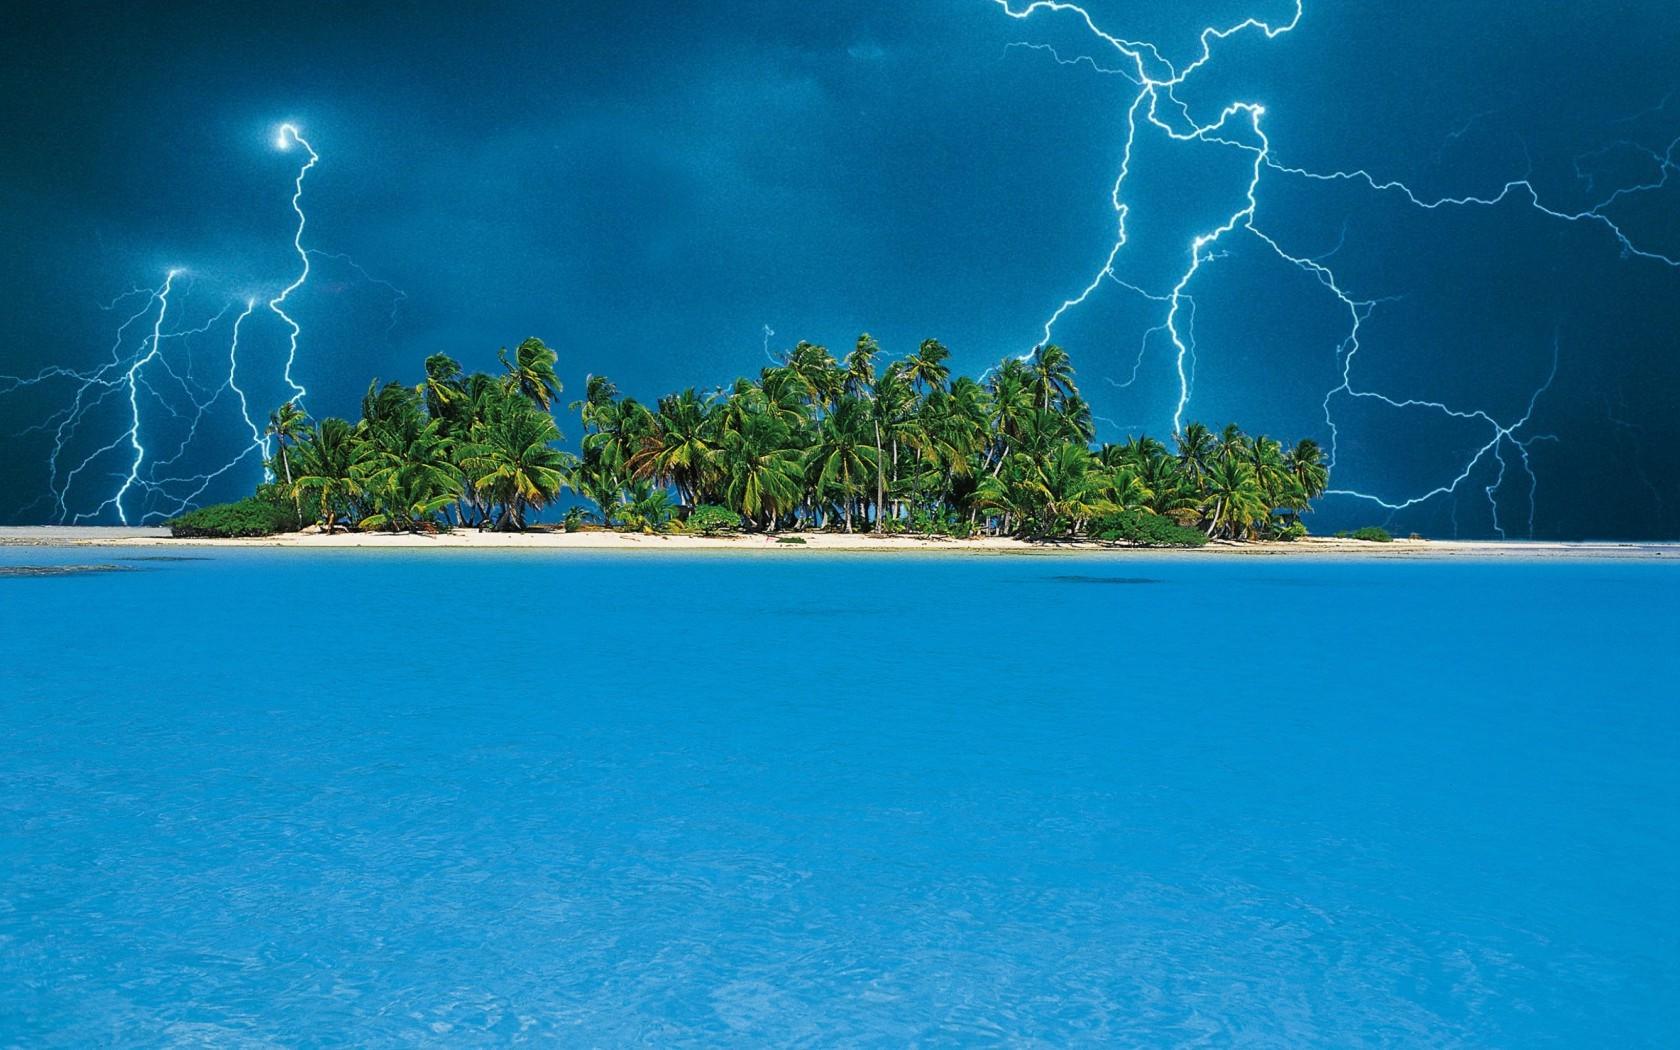 Hd Tropical Island Beach Paradise Wallpapers And Backgrounds: Tropical Island Wallpaper Screensavers